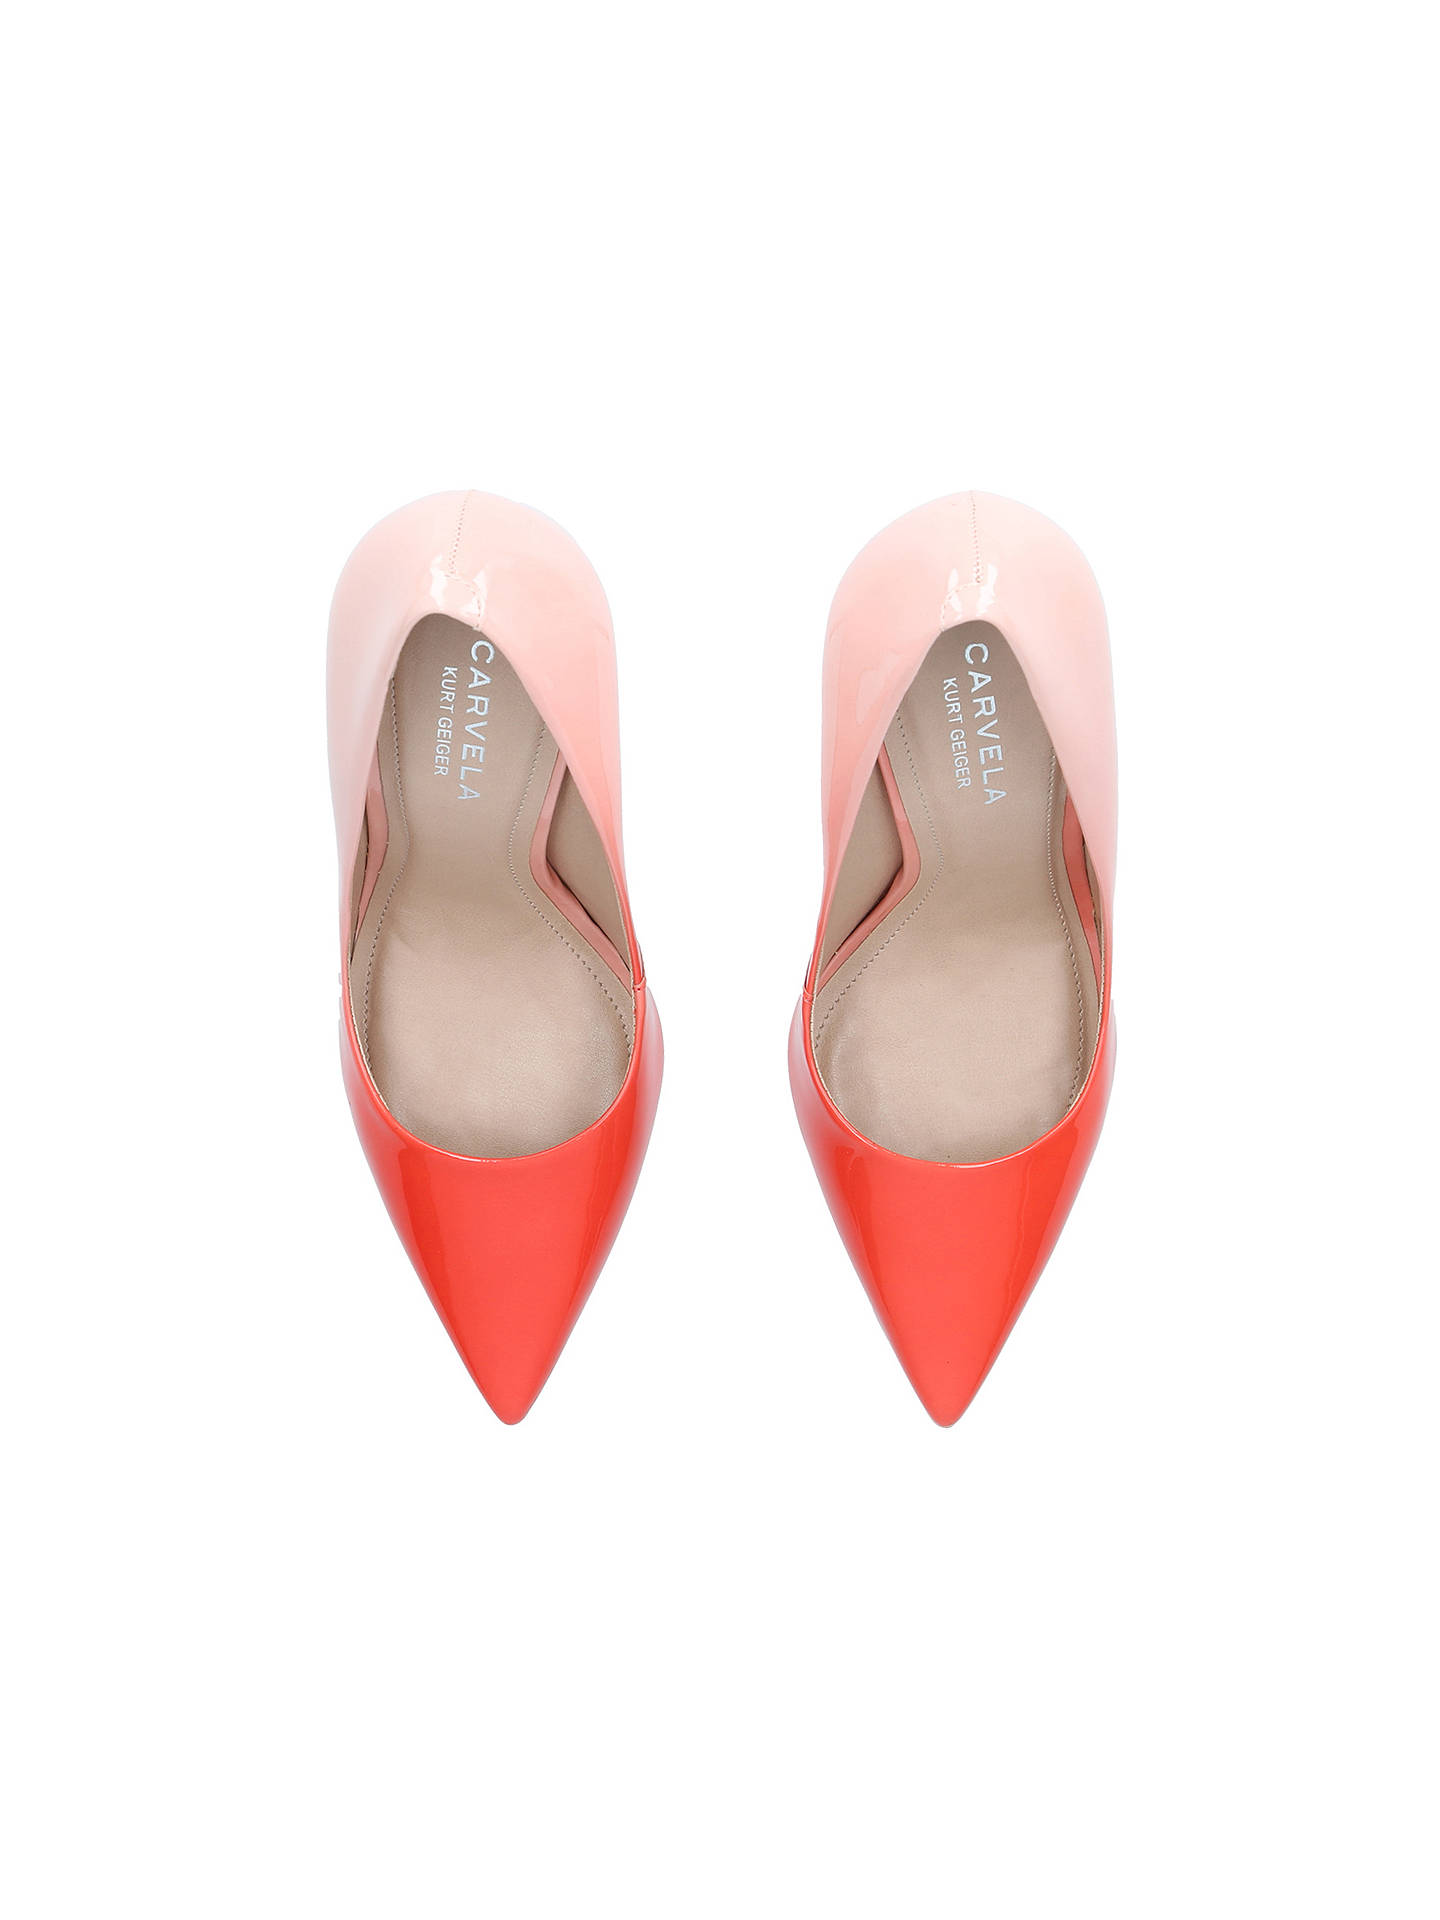 d009d95f010 Carvela Alice Stiletto Heeled Court Shoes at John Lewis & Partners